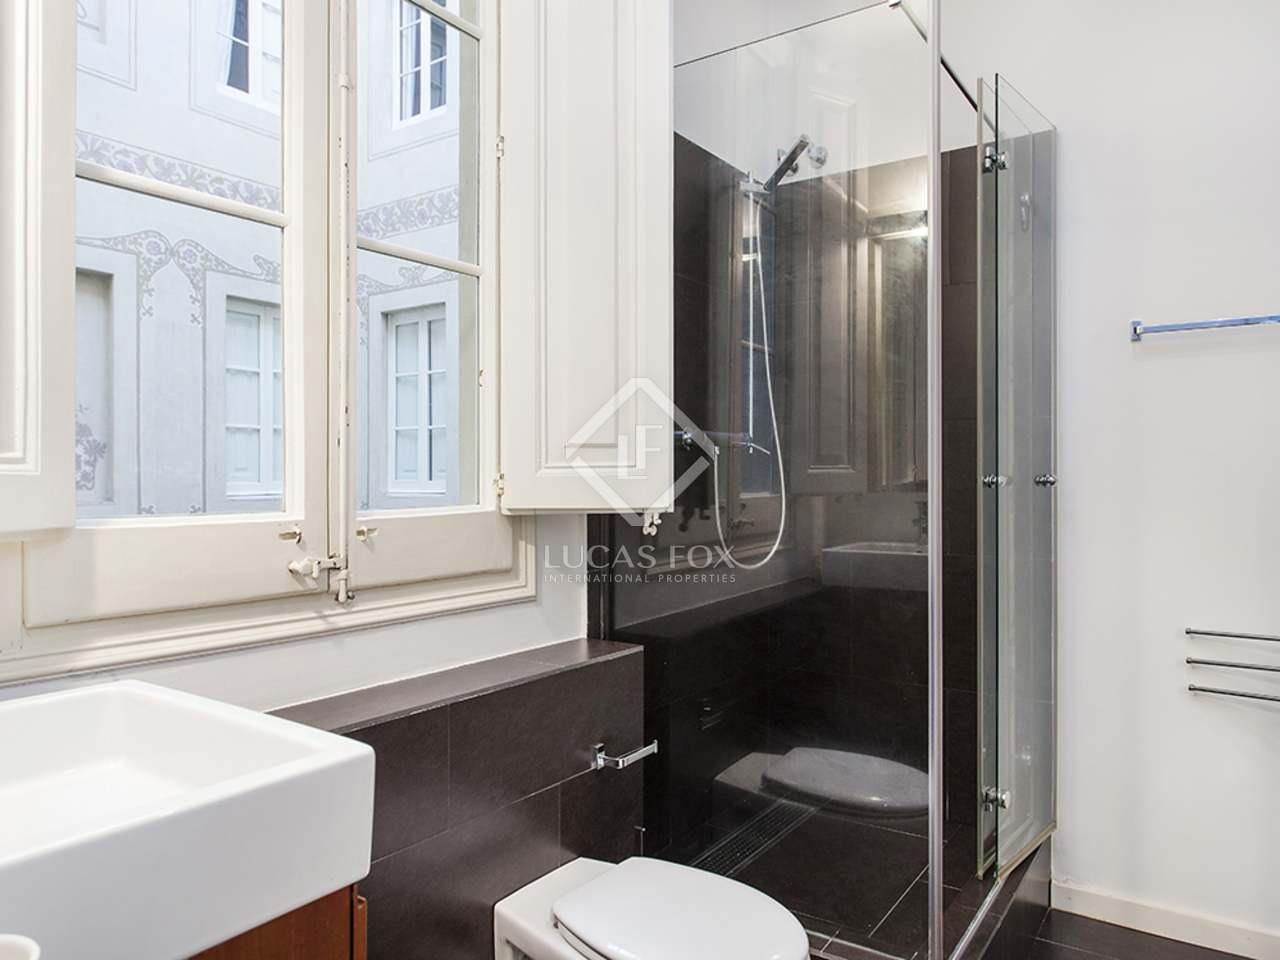 Appartement de 98m a vendre g tico barcelone for Appartement avec piscine barcelone